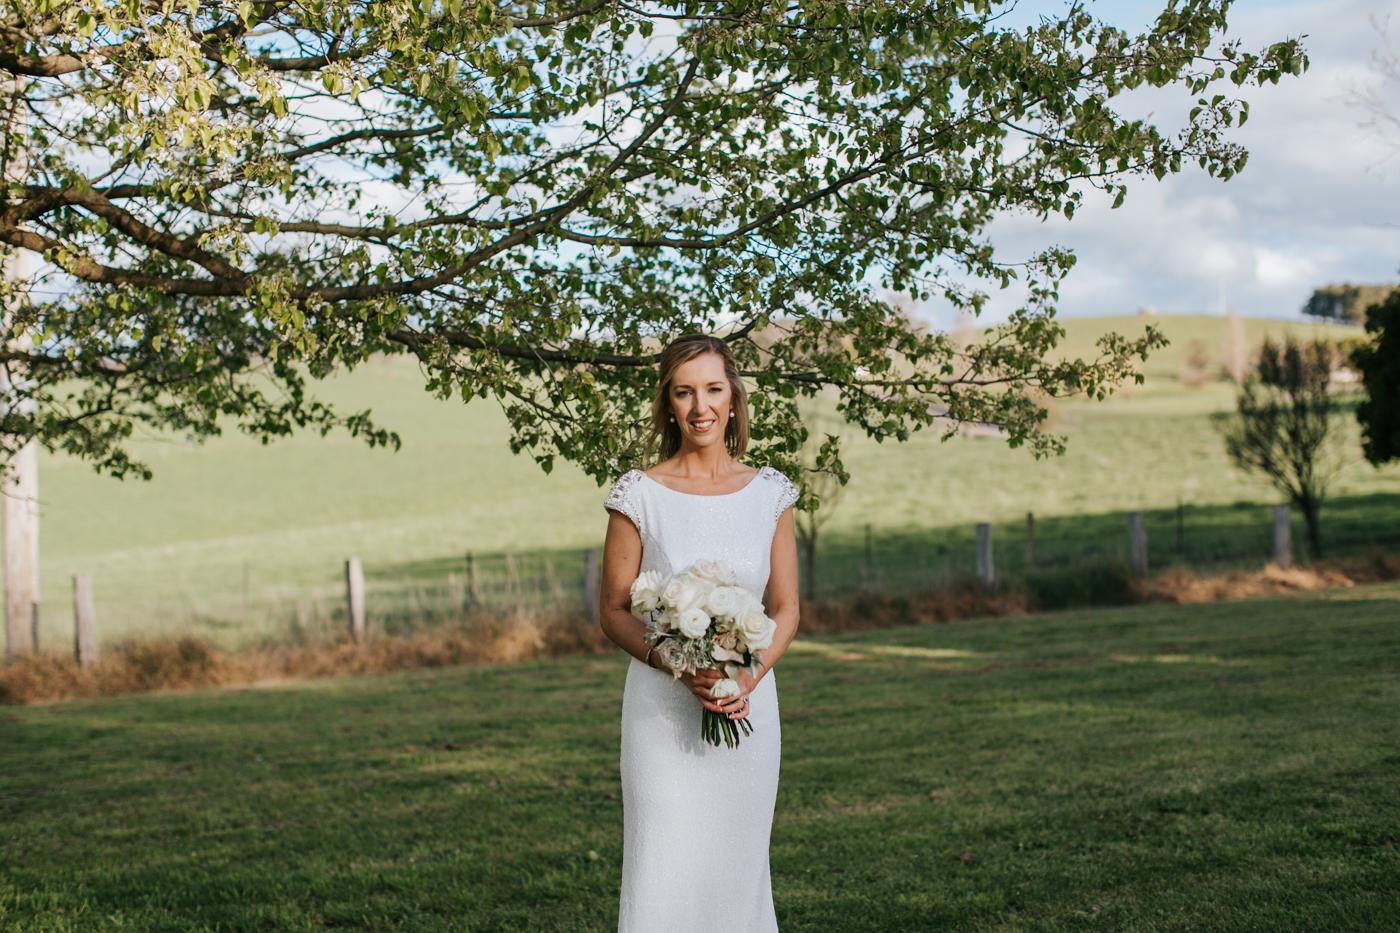 Bridget & James - Orange Country Wedding - Samantha Heather Photography-113.jpg